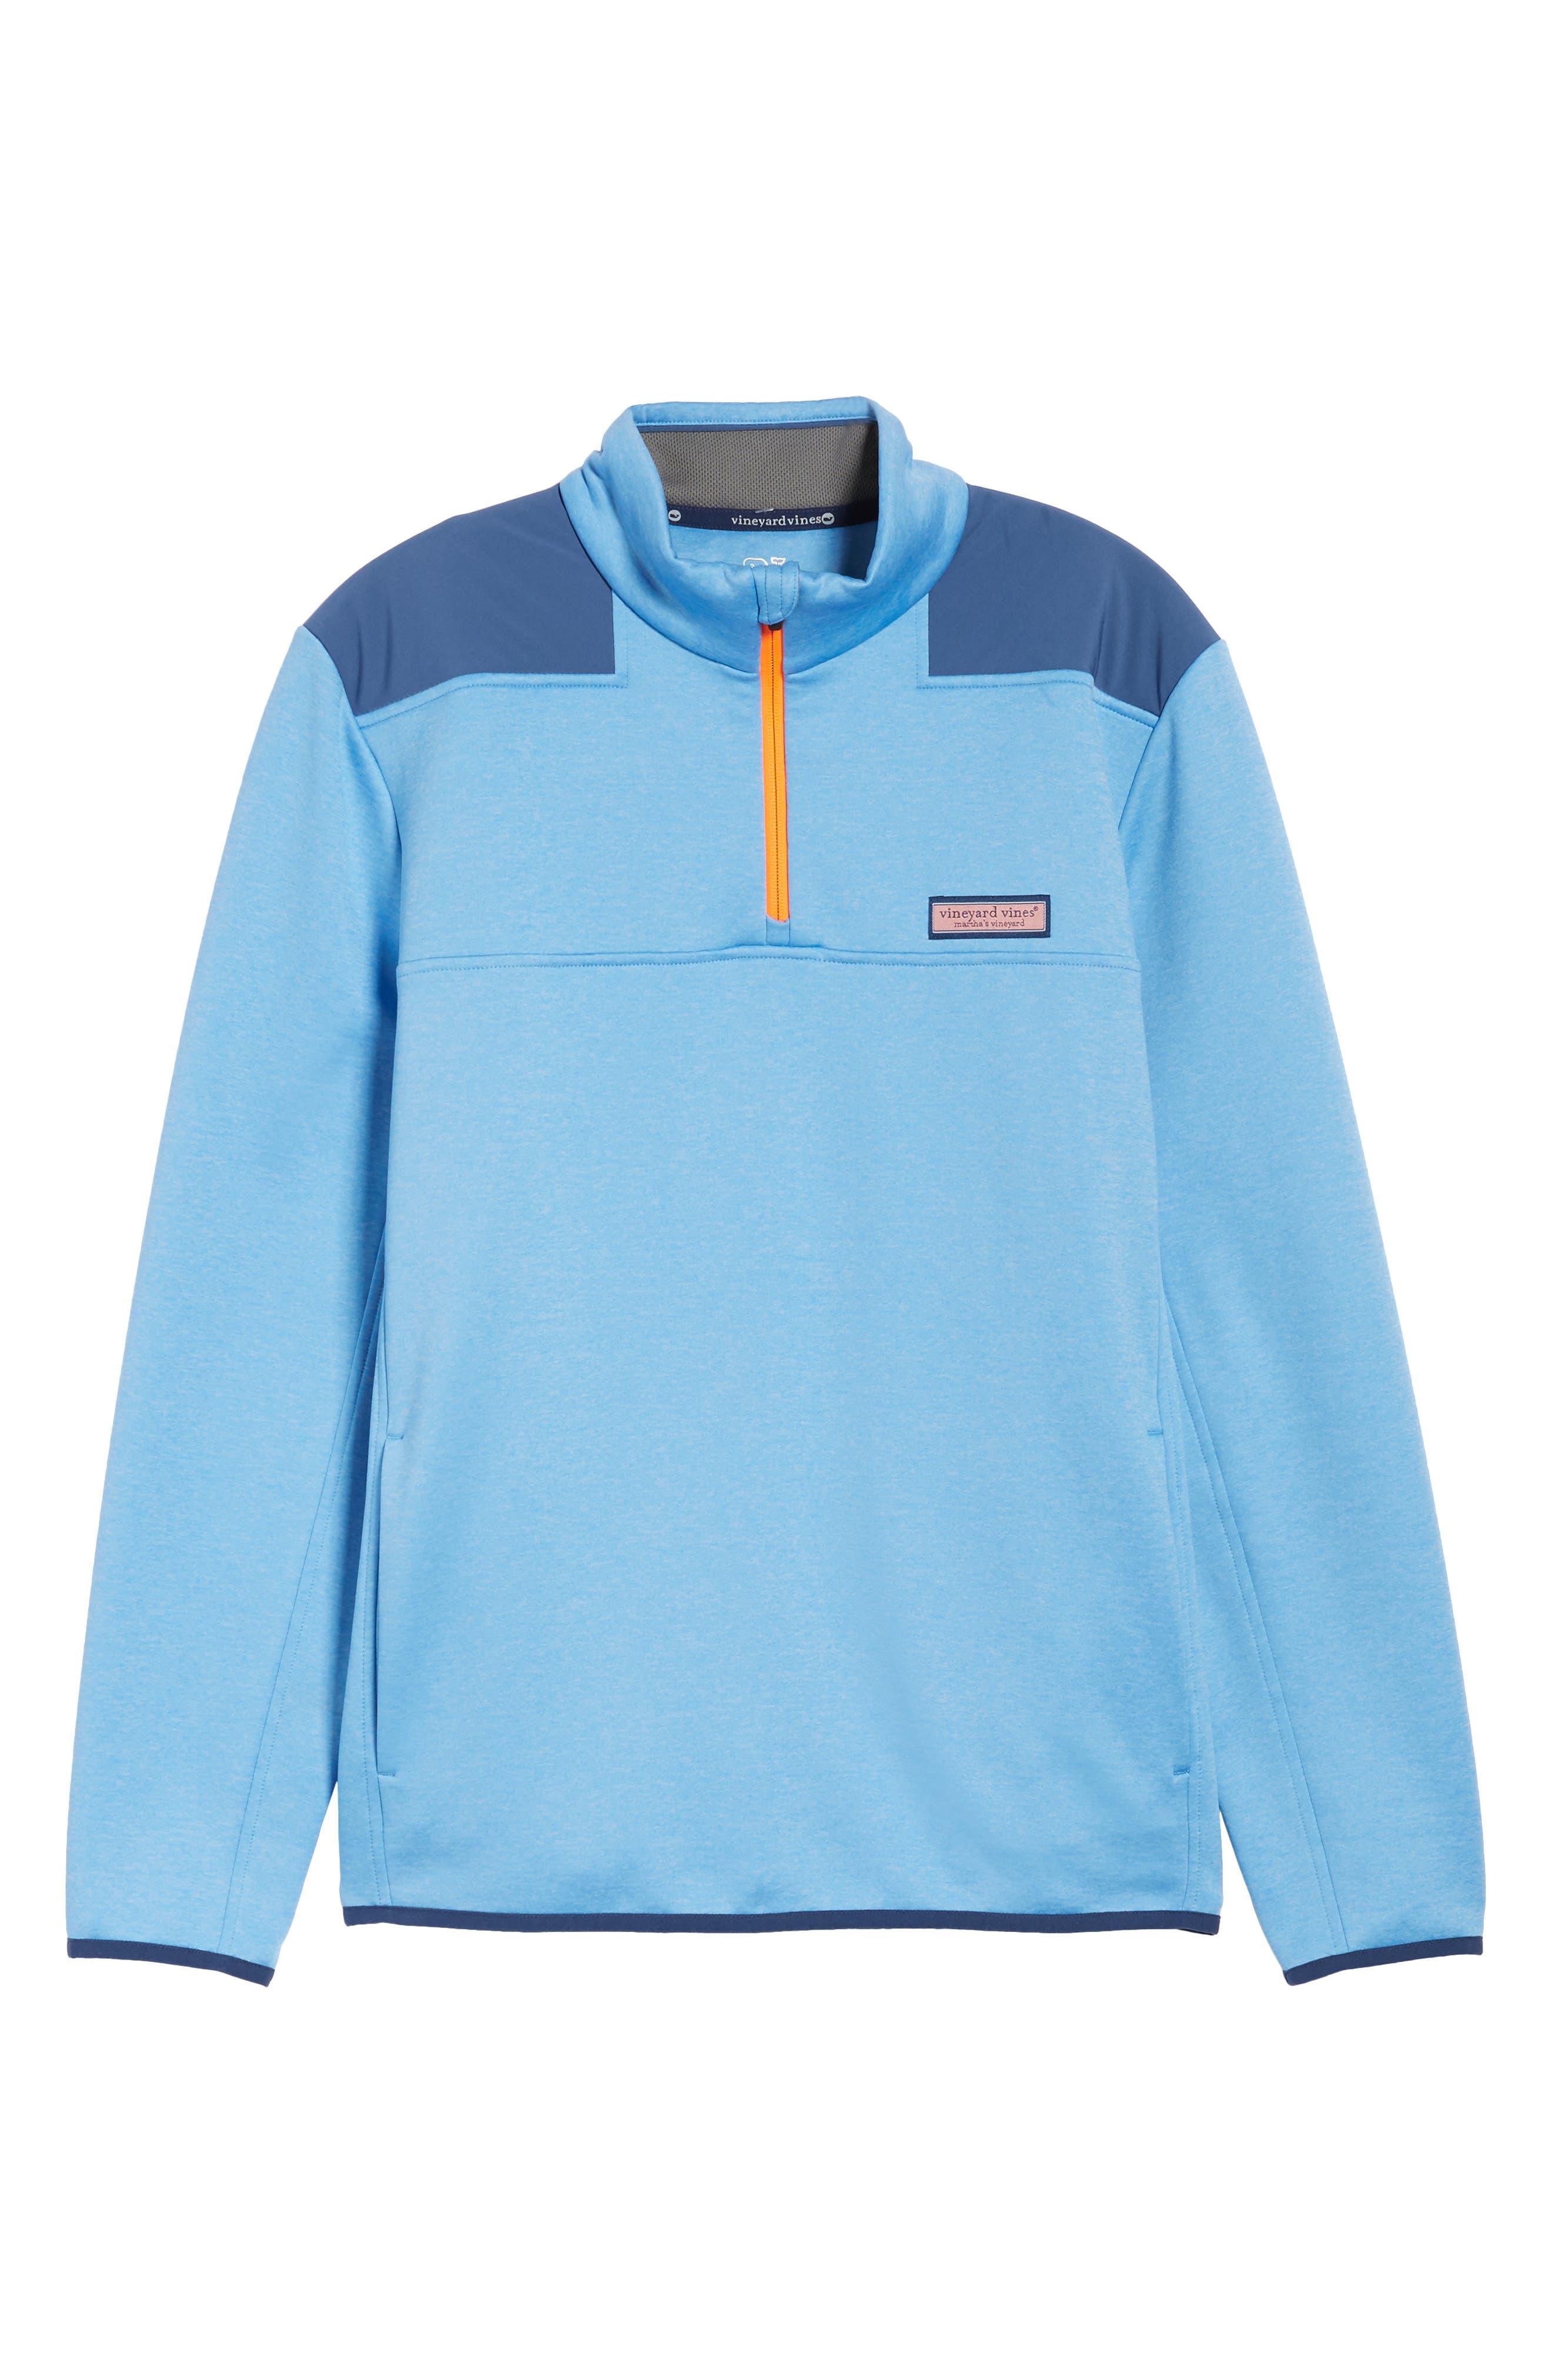 Shep Performance Fleece Quarter Zip Pullover,                             Alternate thumbnail 6, color,                             Ocean Breeze